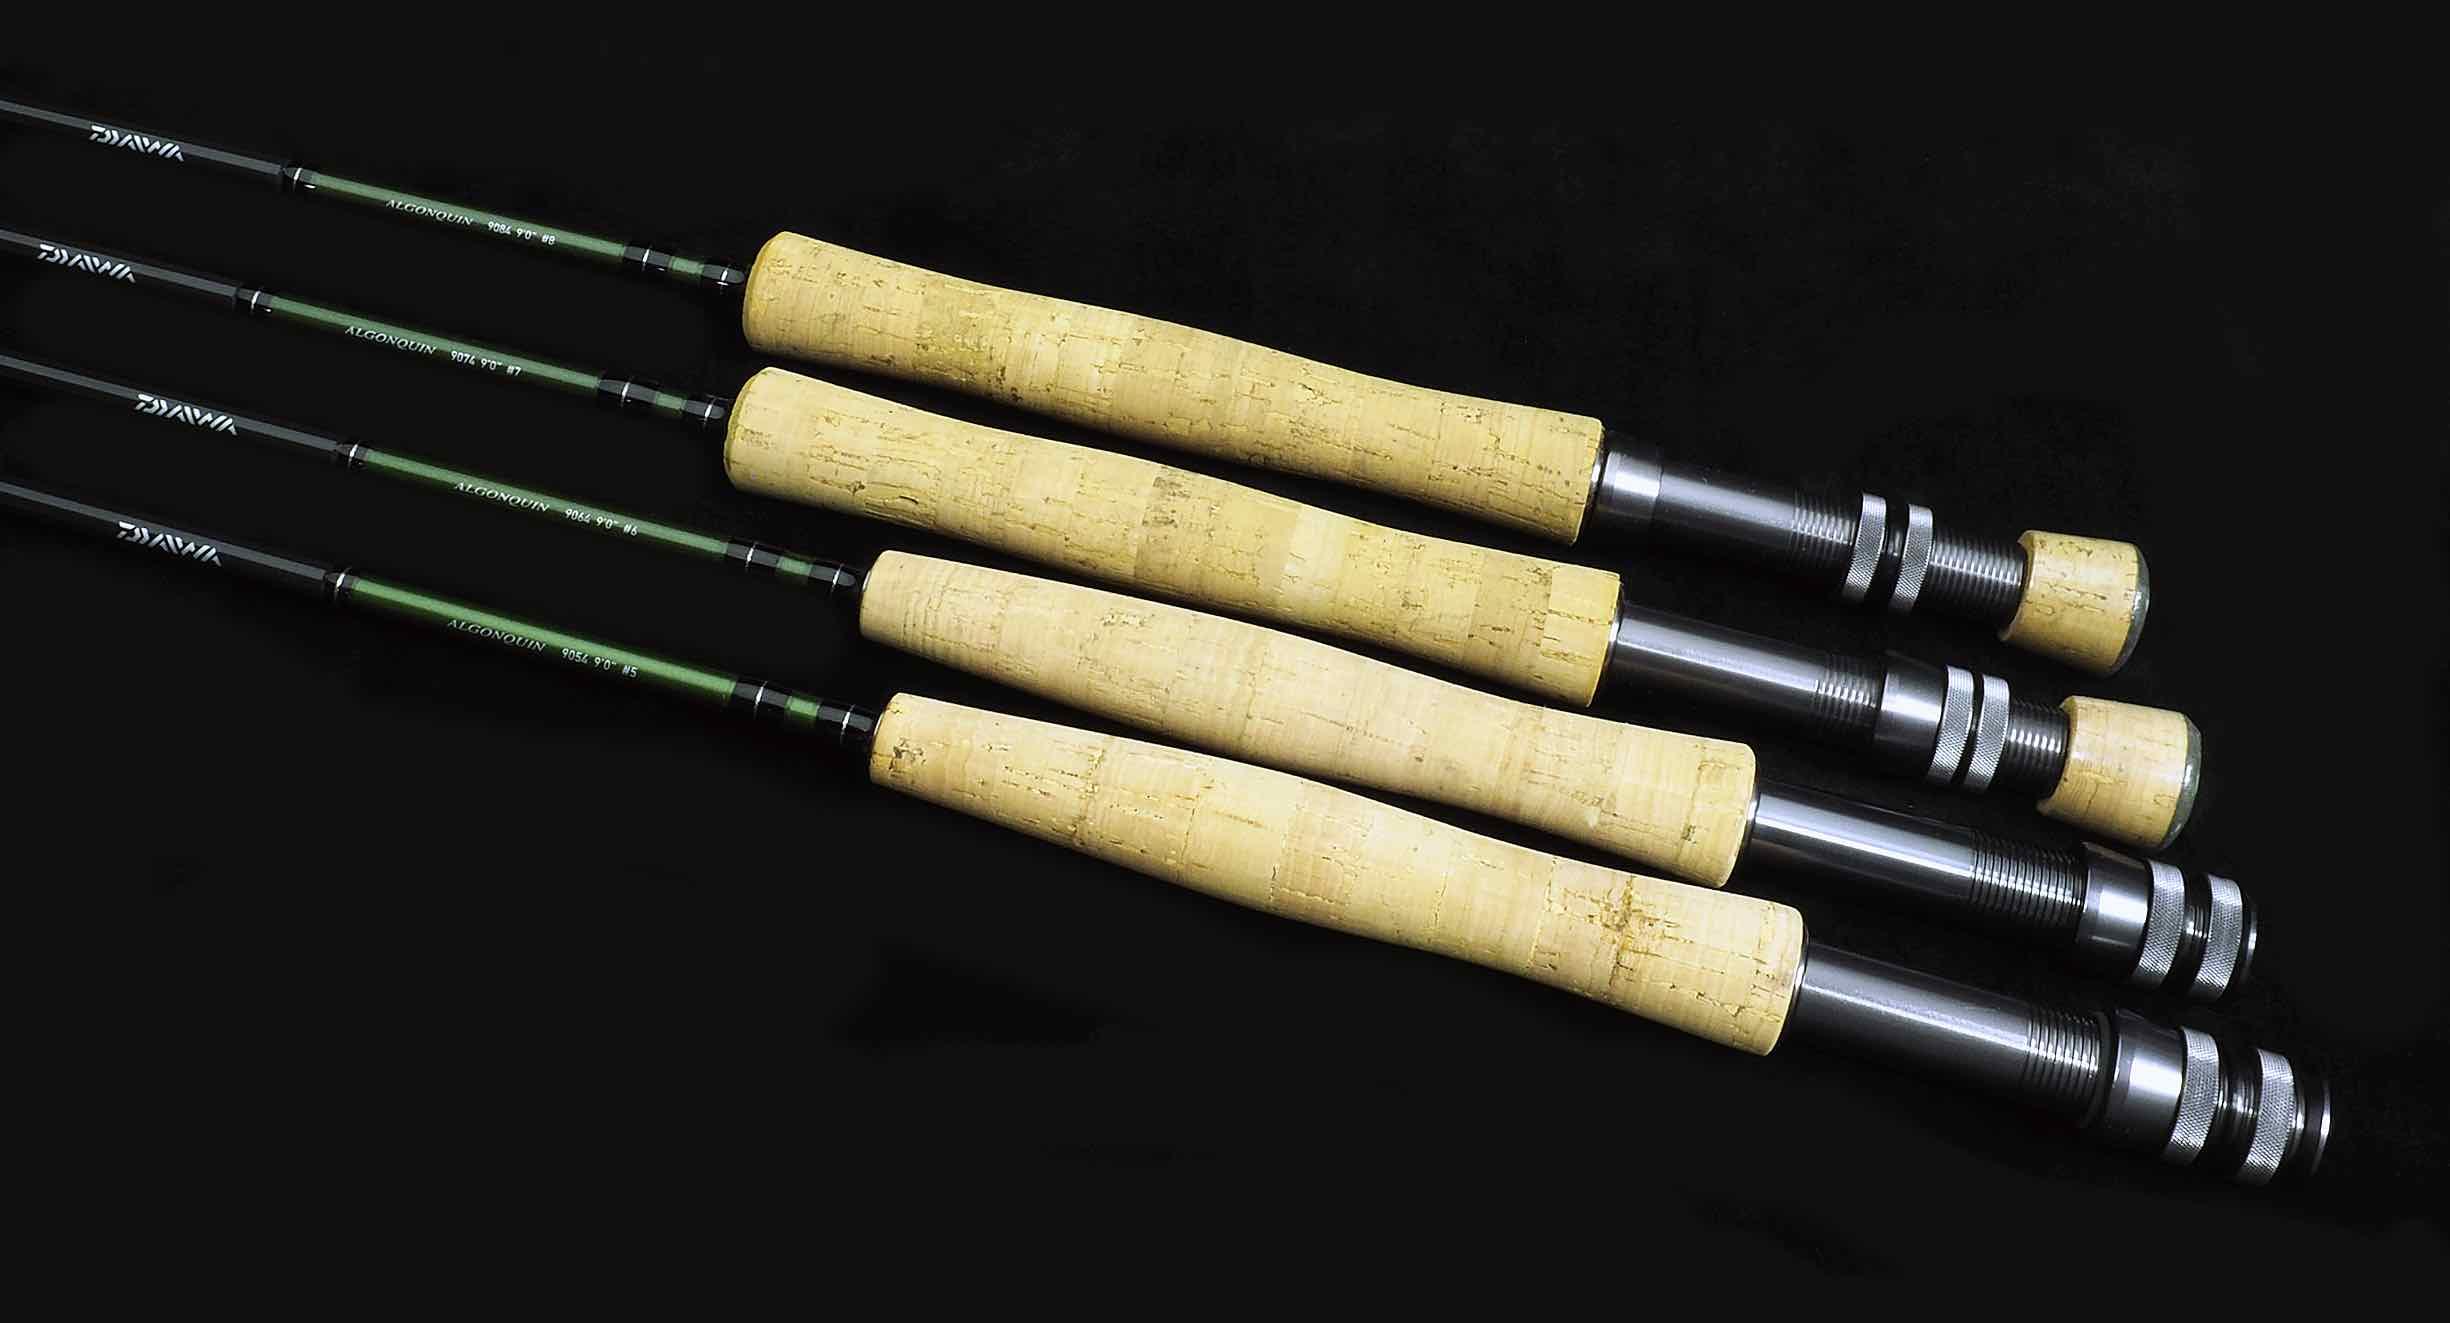 Daiwa Algonquin Fly Rods.